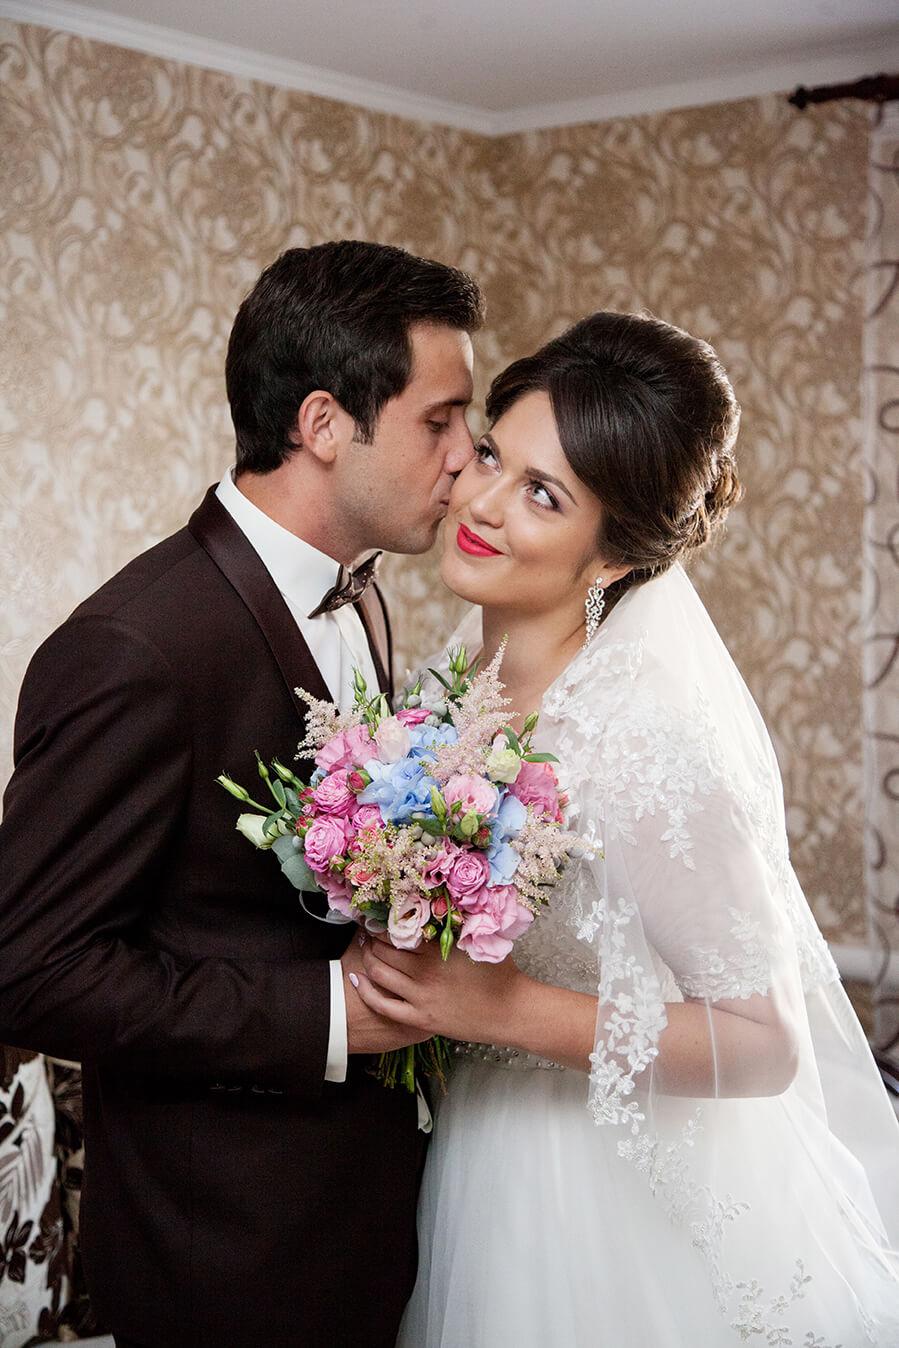 vykup-vstrecha-zheniha-i-nevesty-svadebnoe-foto-fotograf-kiev-5